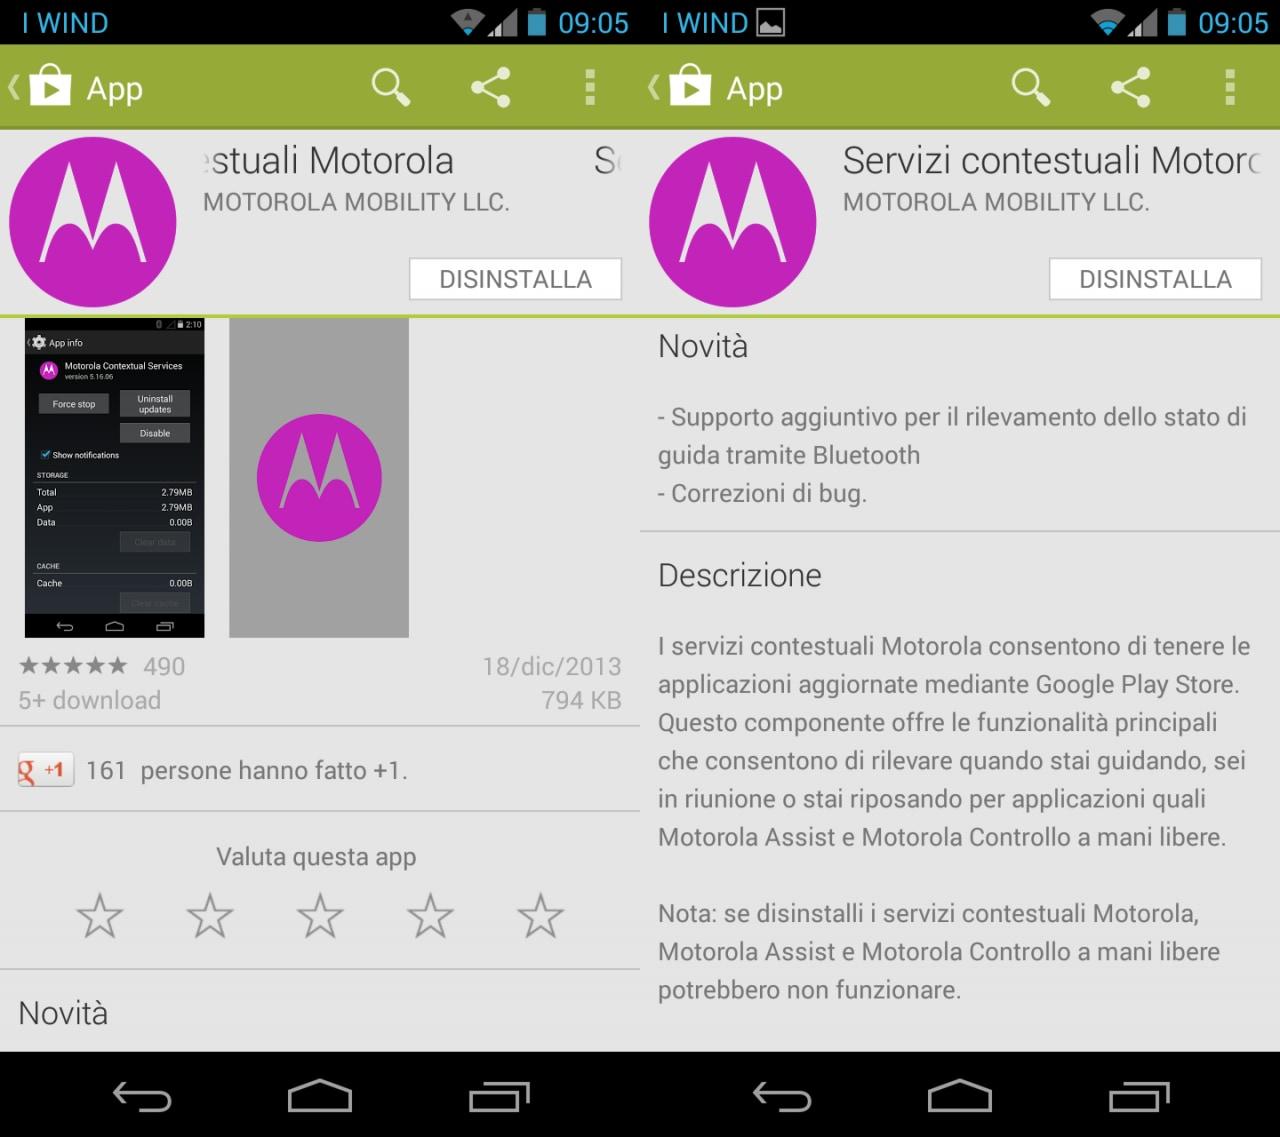 Servizi contestuali Motorola